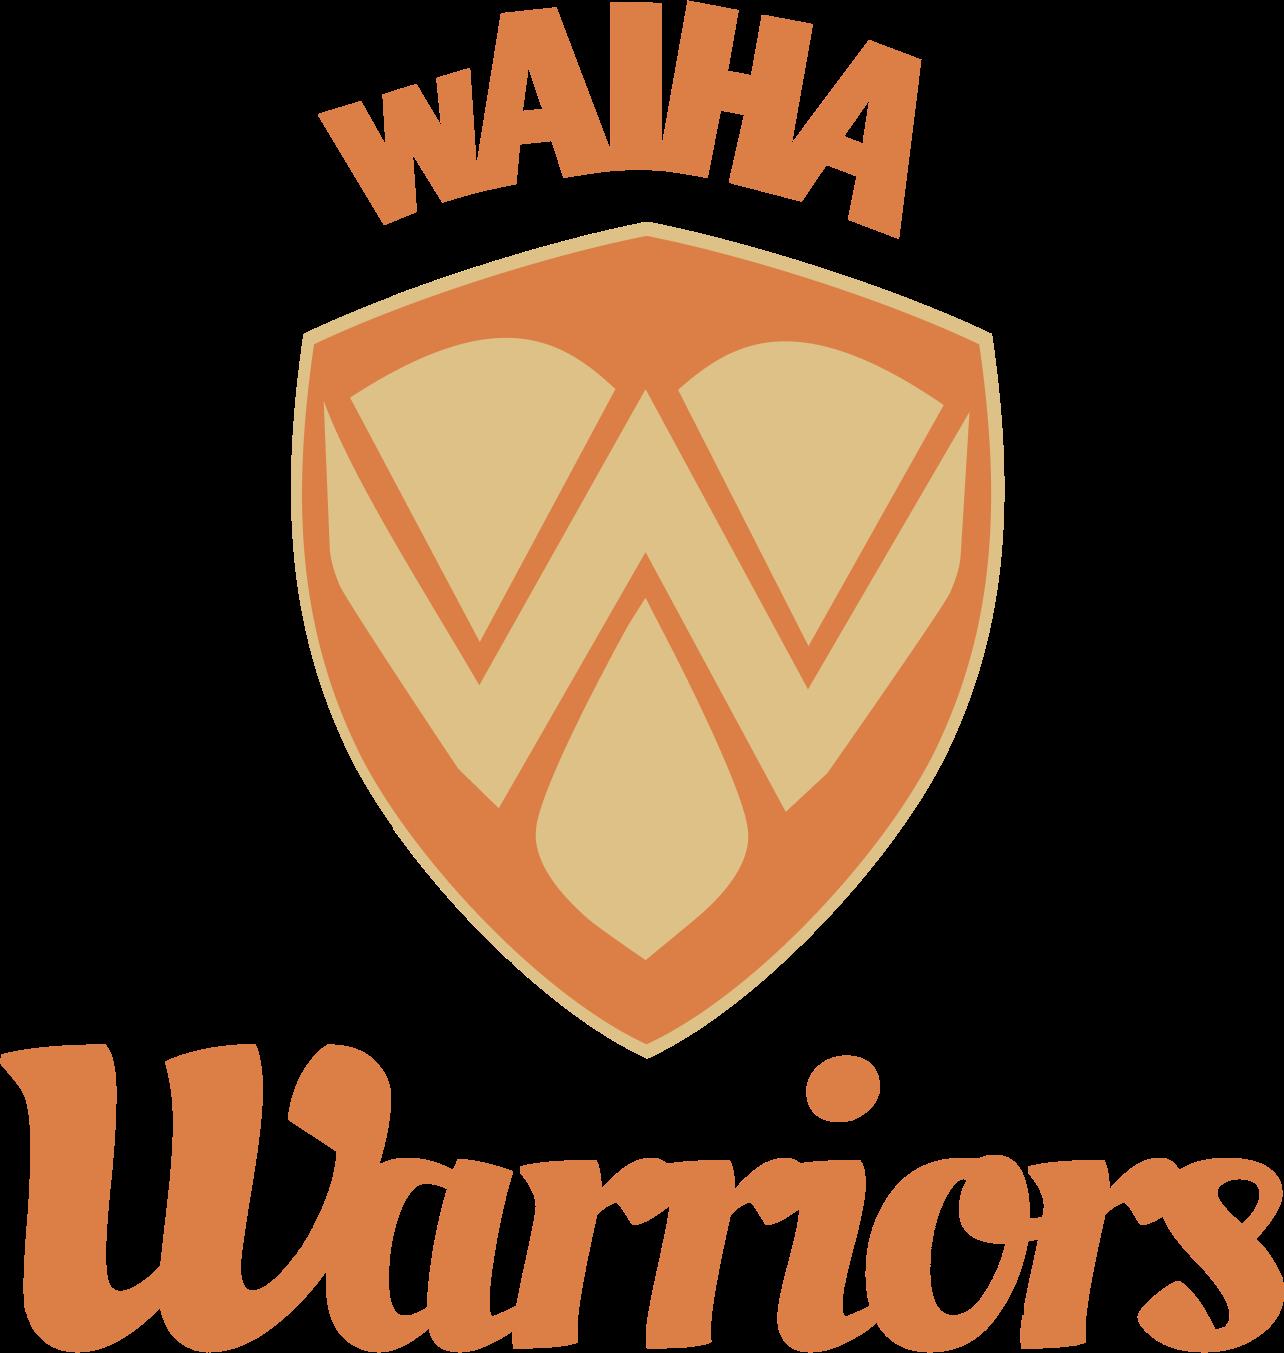 wAIHA Warriors